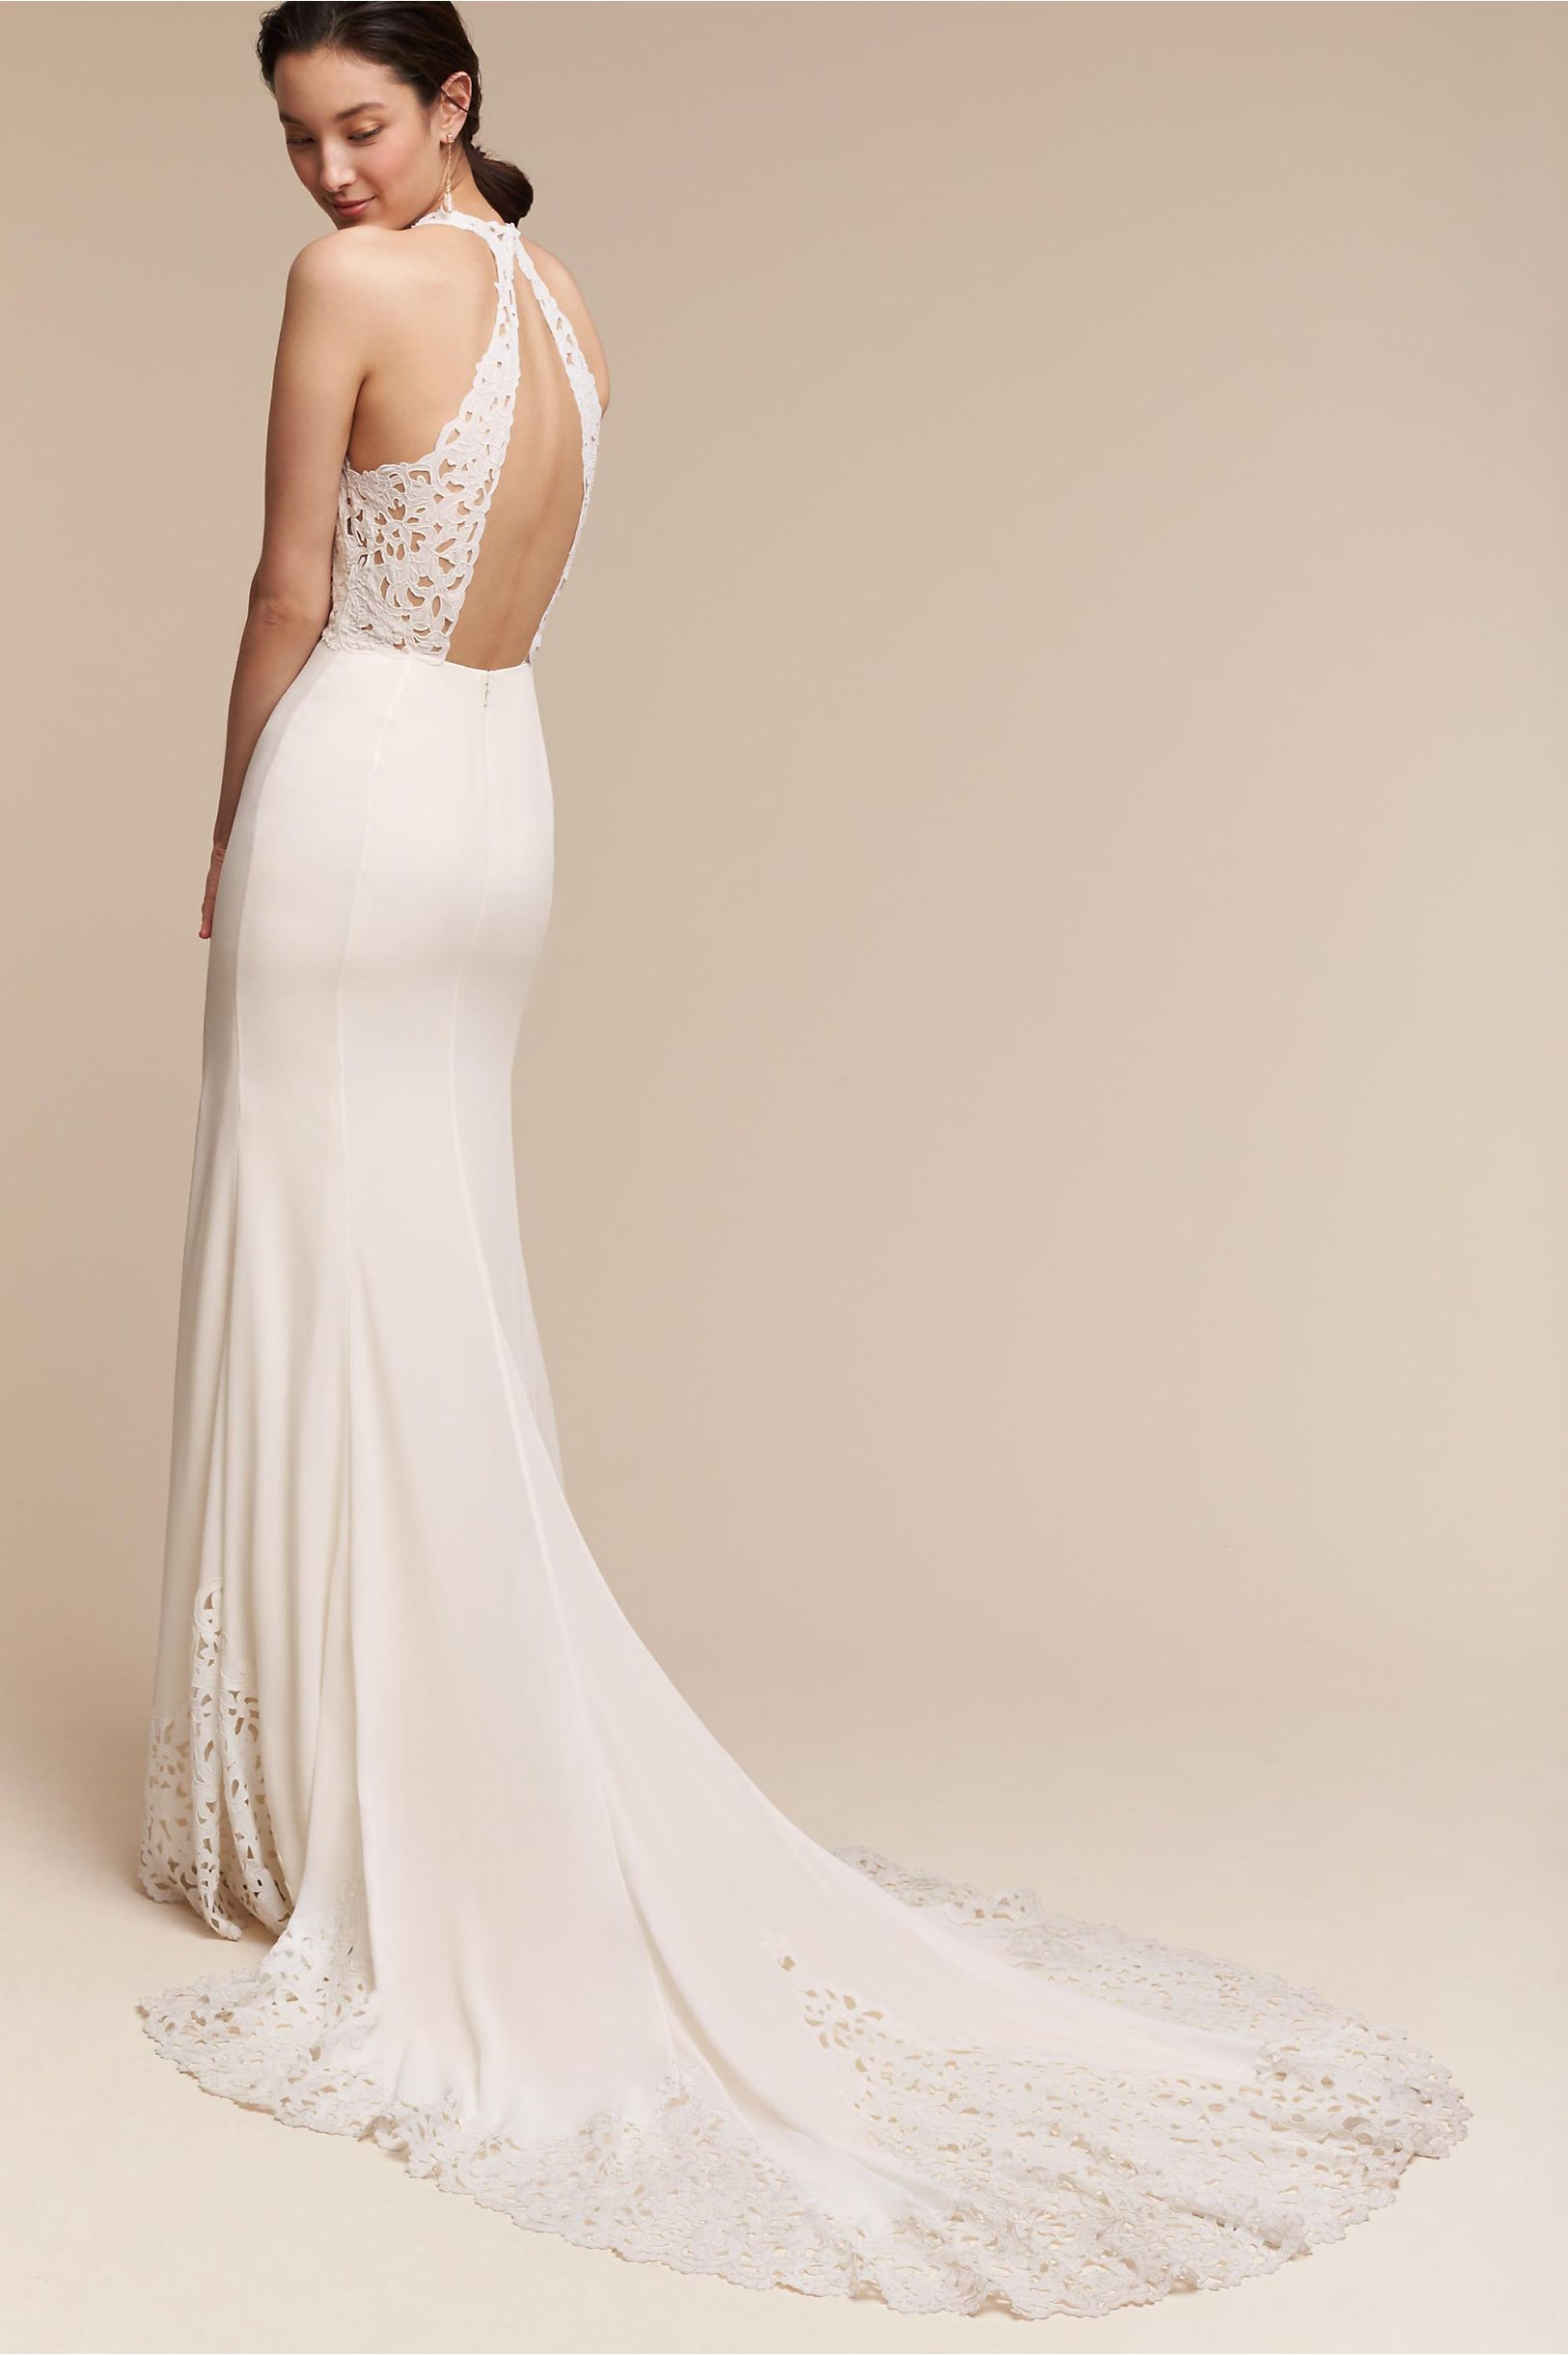 sundress wedding dress BHLDN Cruz Gown in Bride Wedding Dresses BHLDN